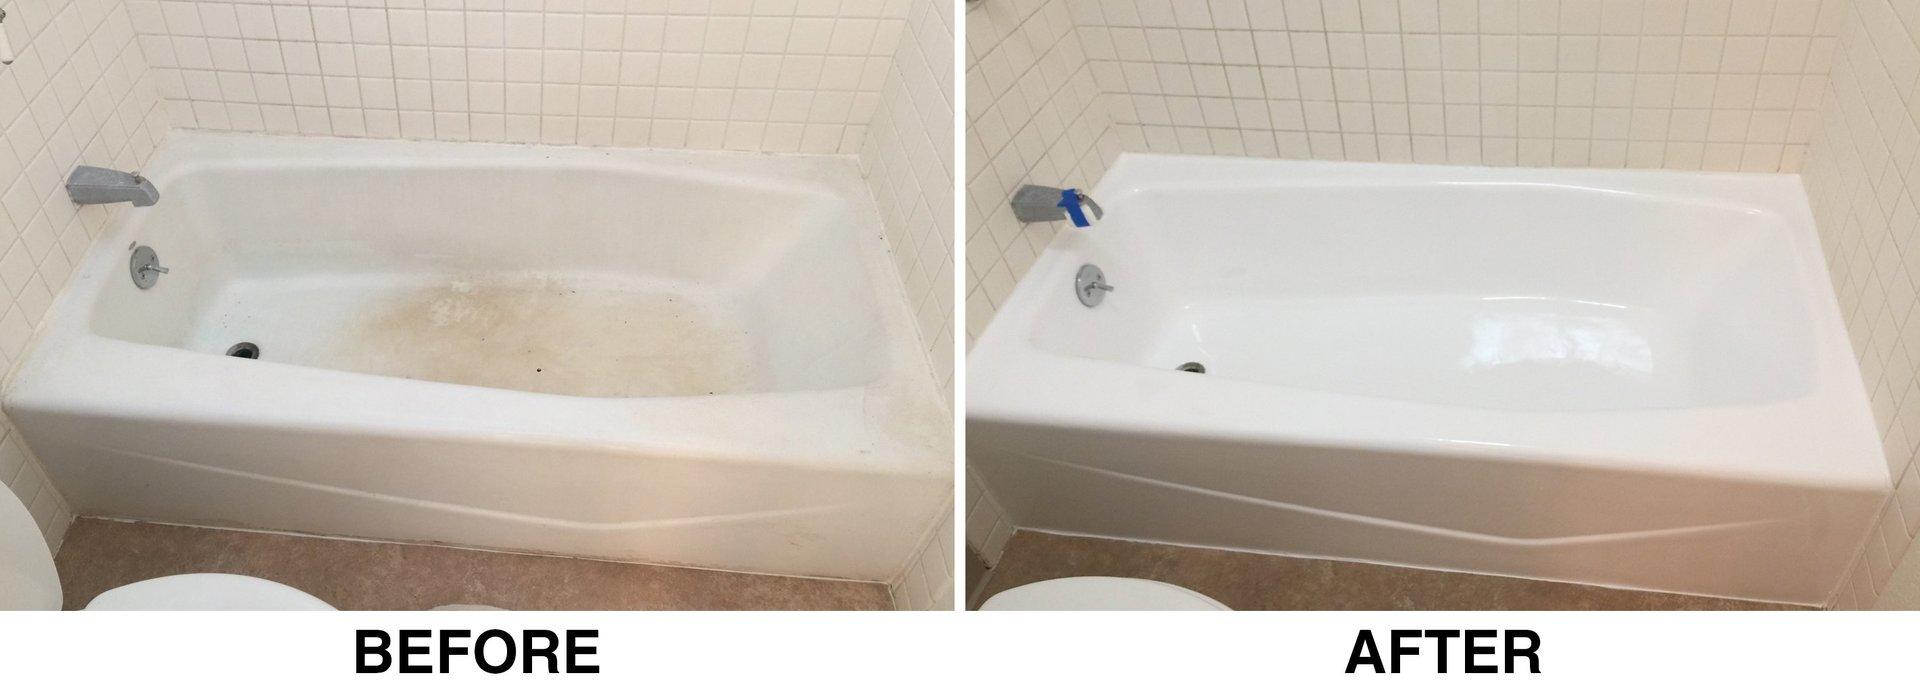 Bathtub & Shower Refinishing Co. of Hawaii image 6